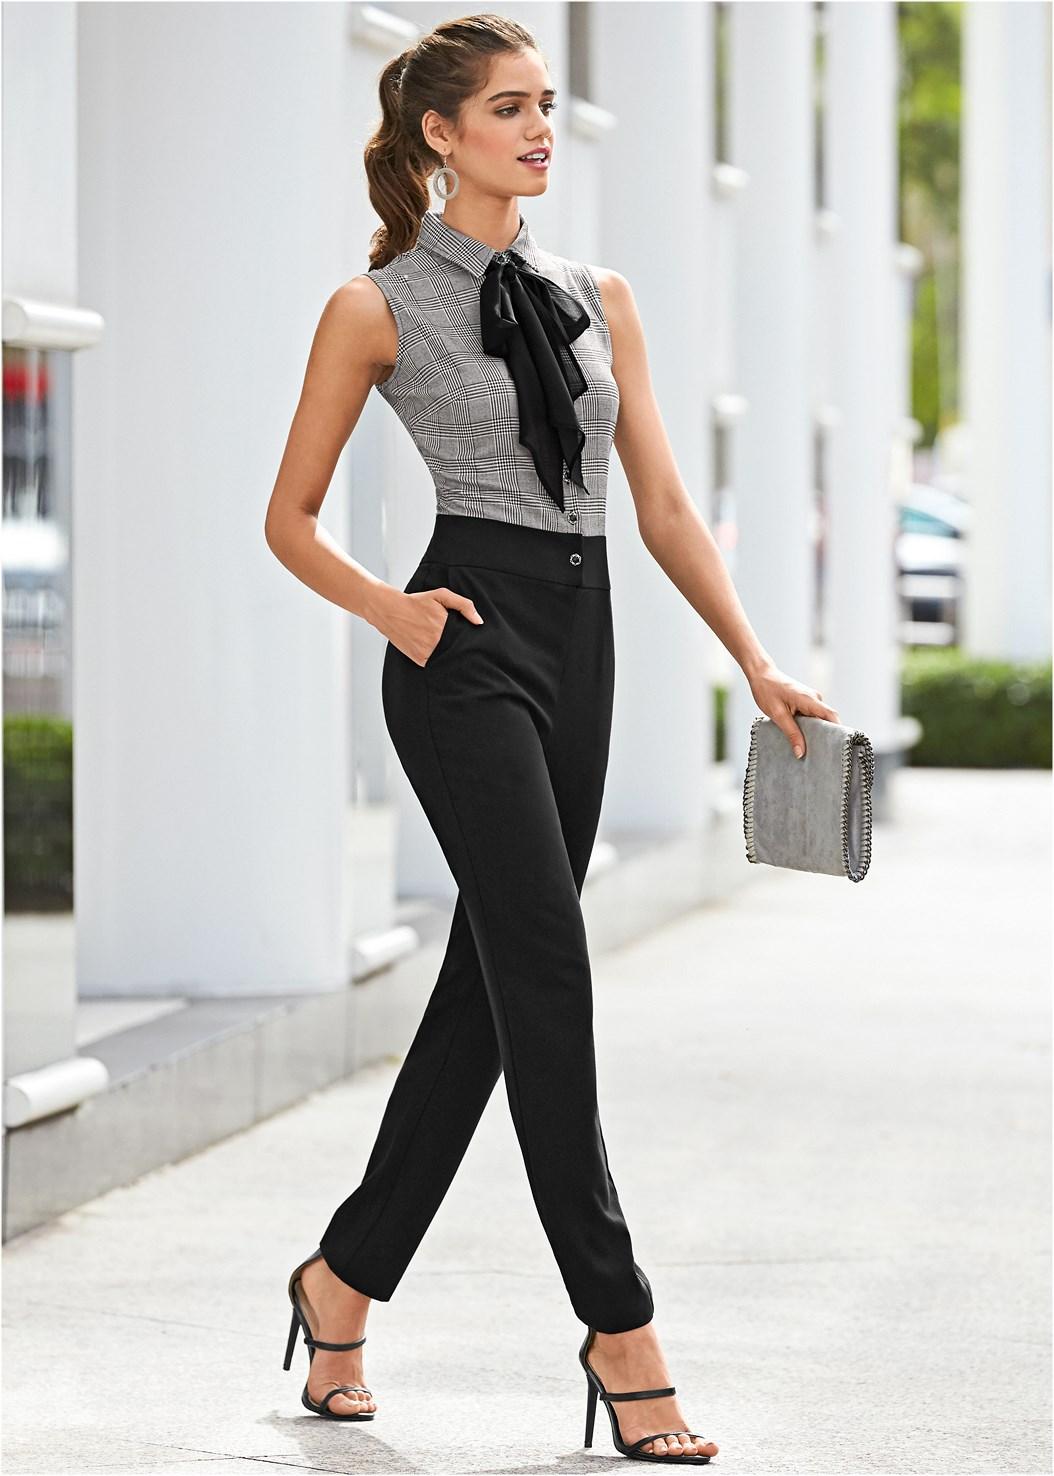 Tie Neck Jumpsuit,High Heel Strappy Sandals,Embellished Lucite Heel